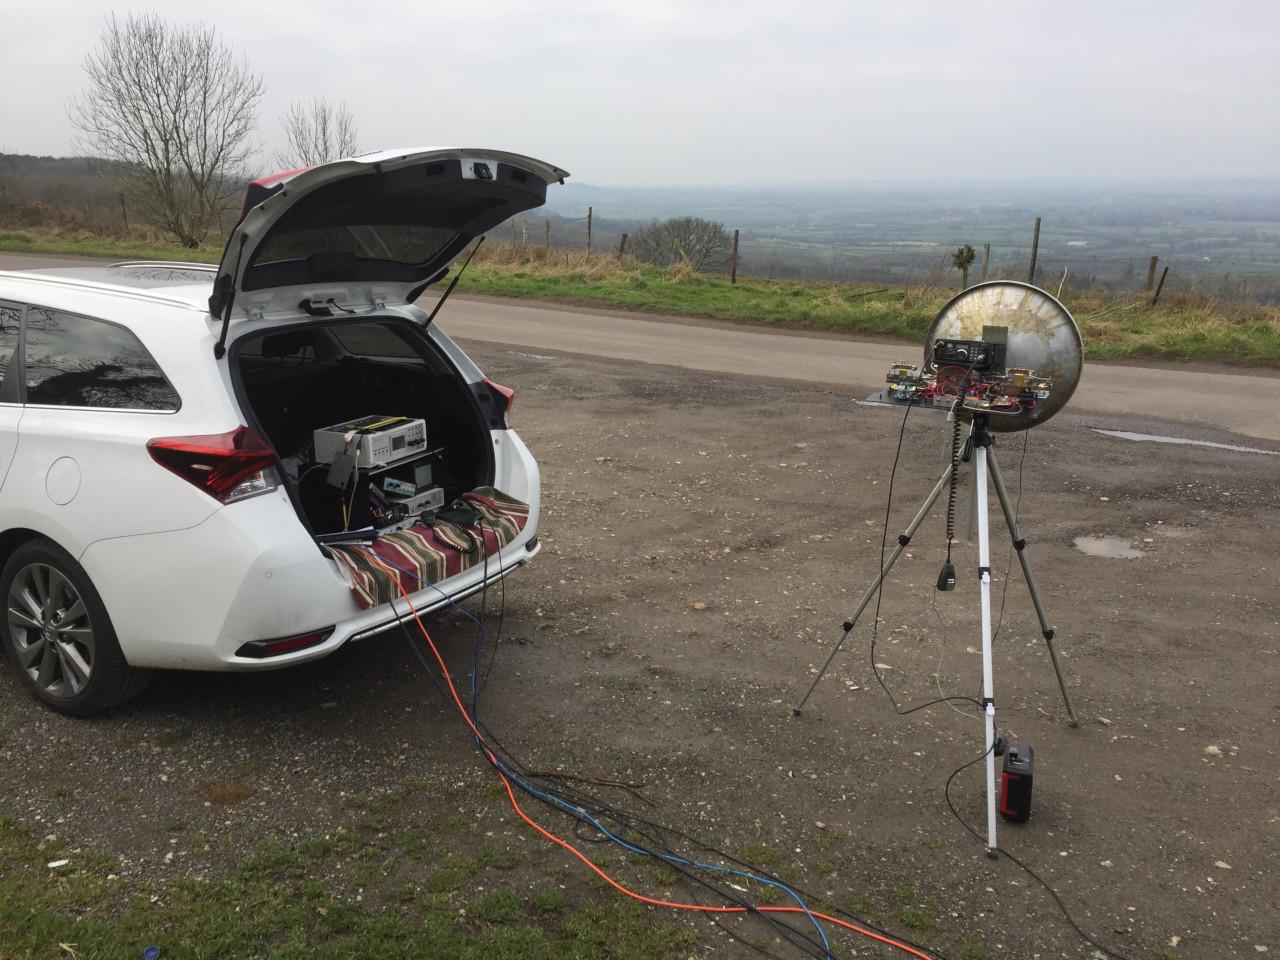 BATC Portsdown 2.4 GHz Transmission